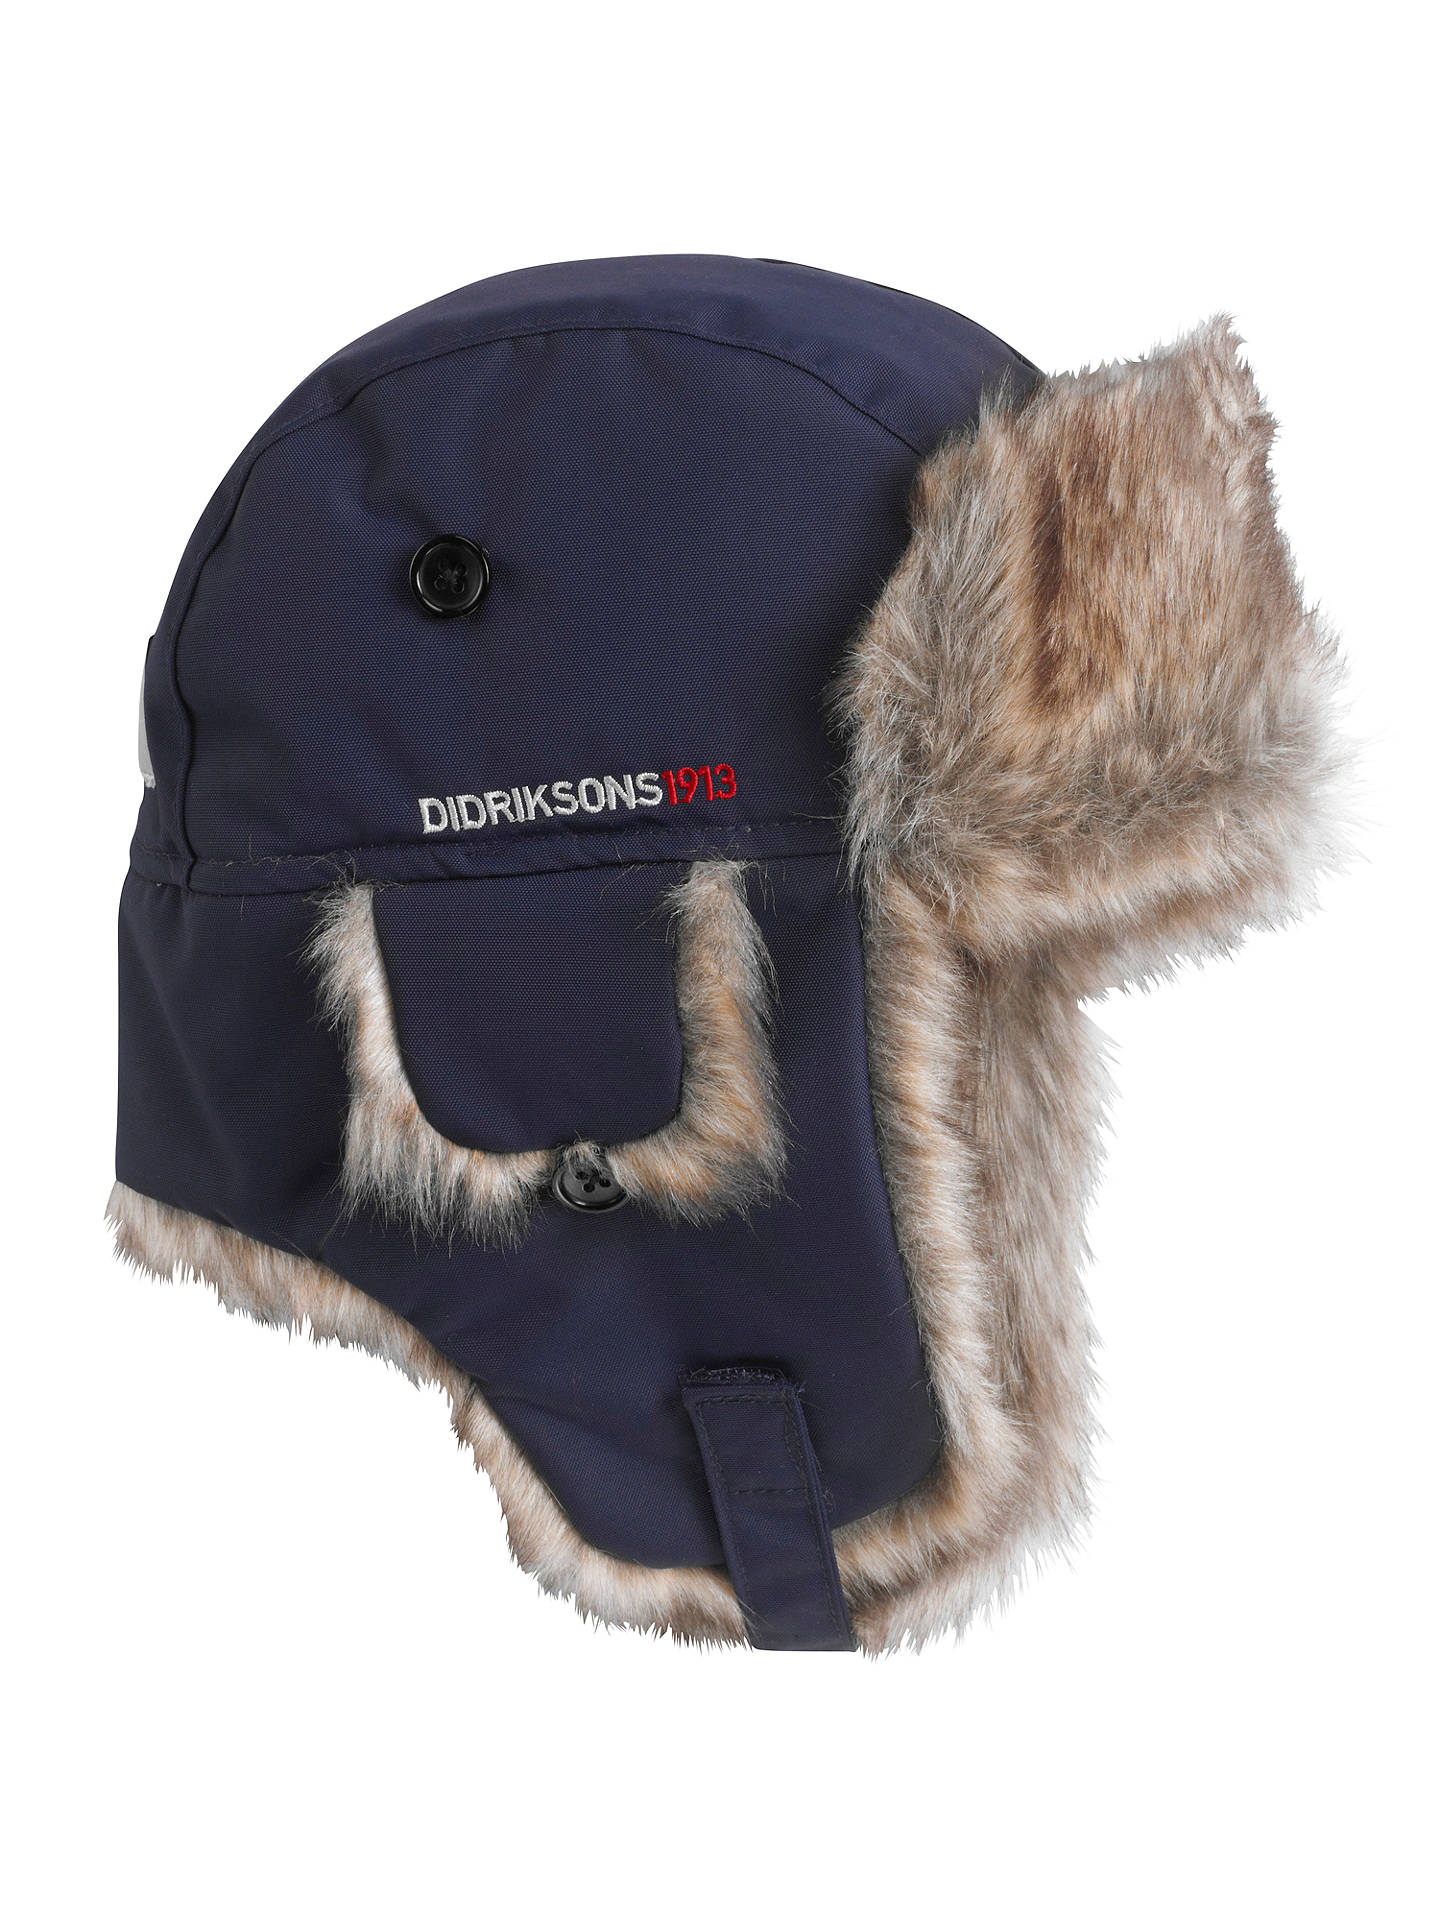 fcf75408bfa6d Didriksons Children s Helge Waterproof Trapper Hat at John Lewis ...